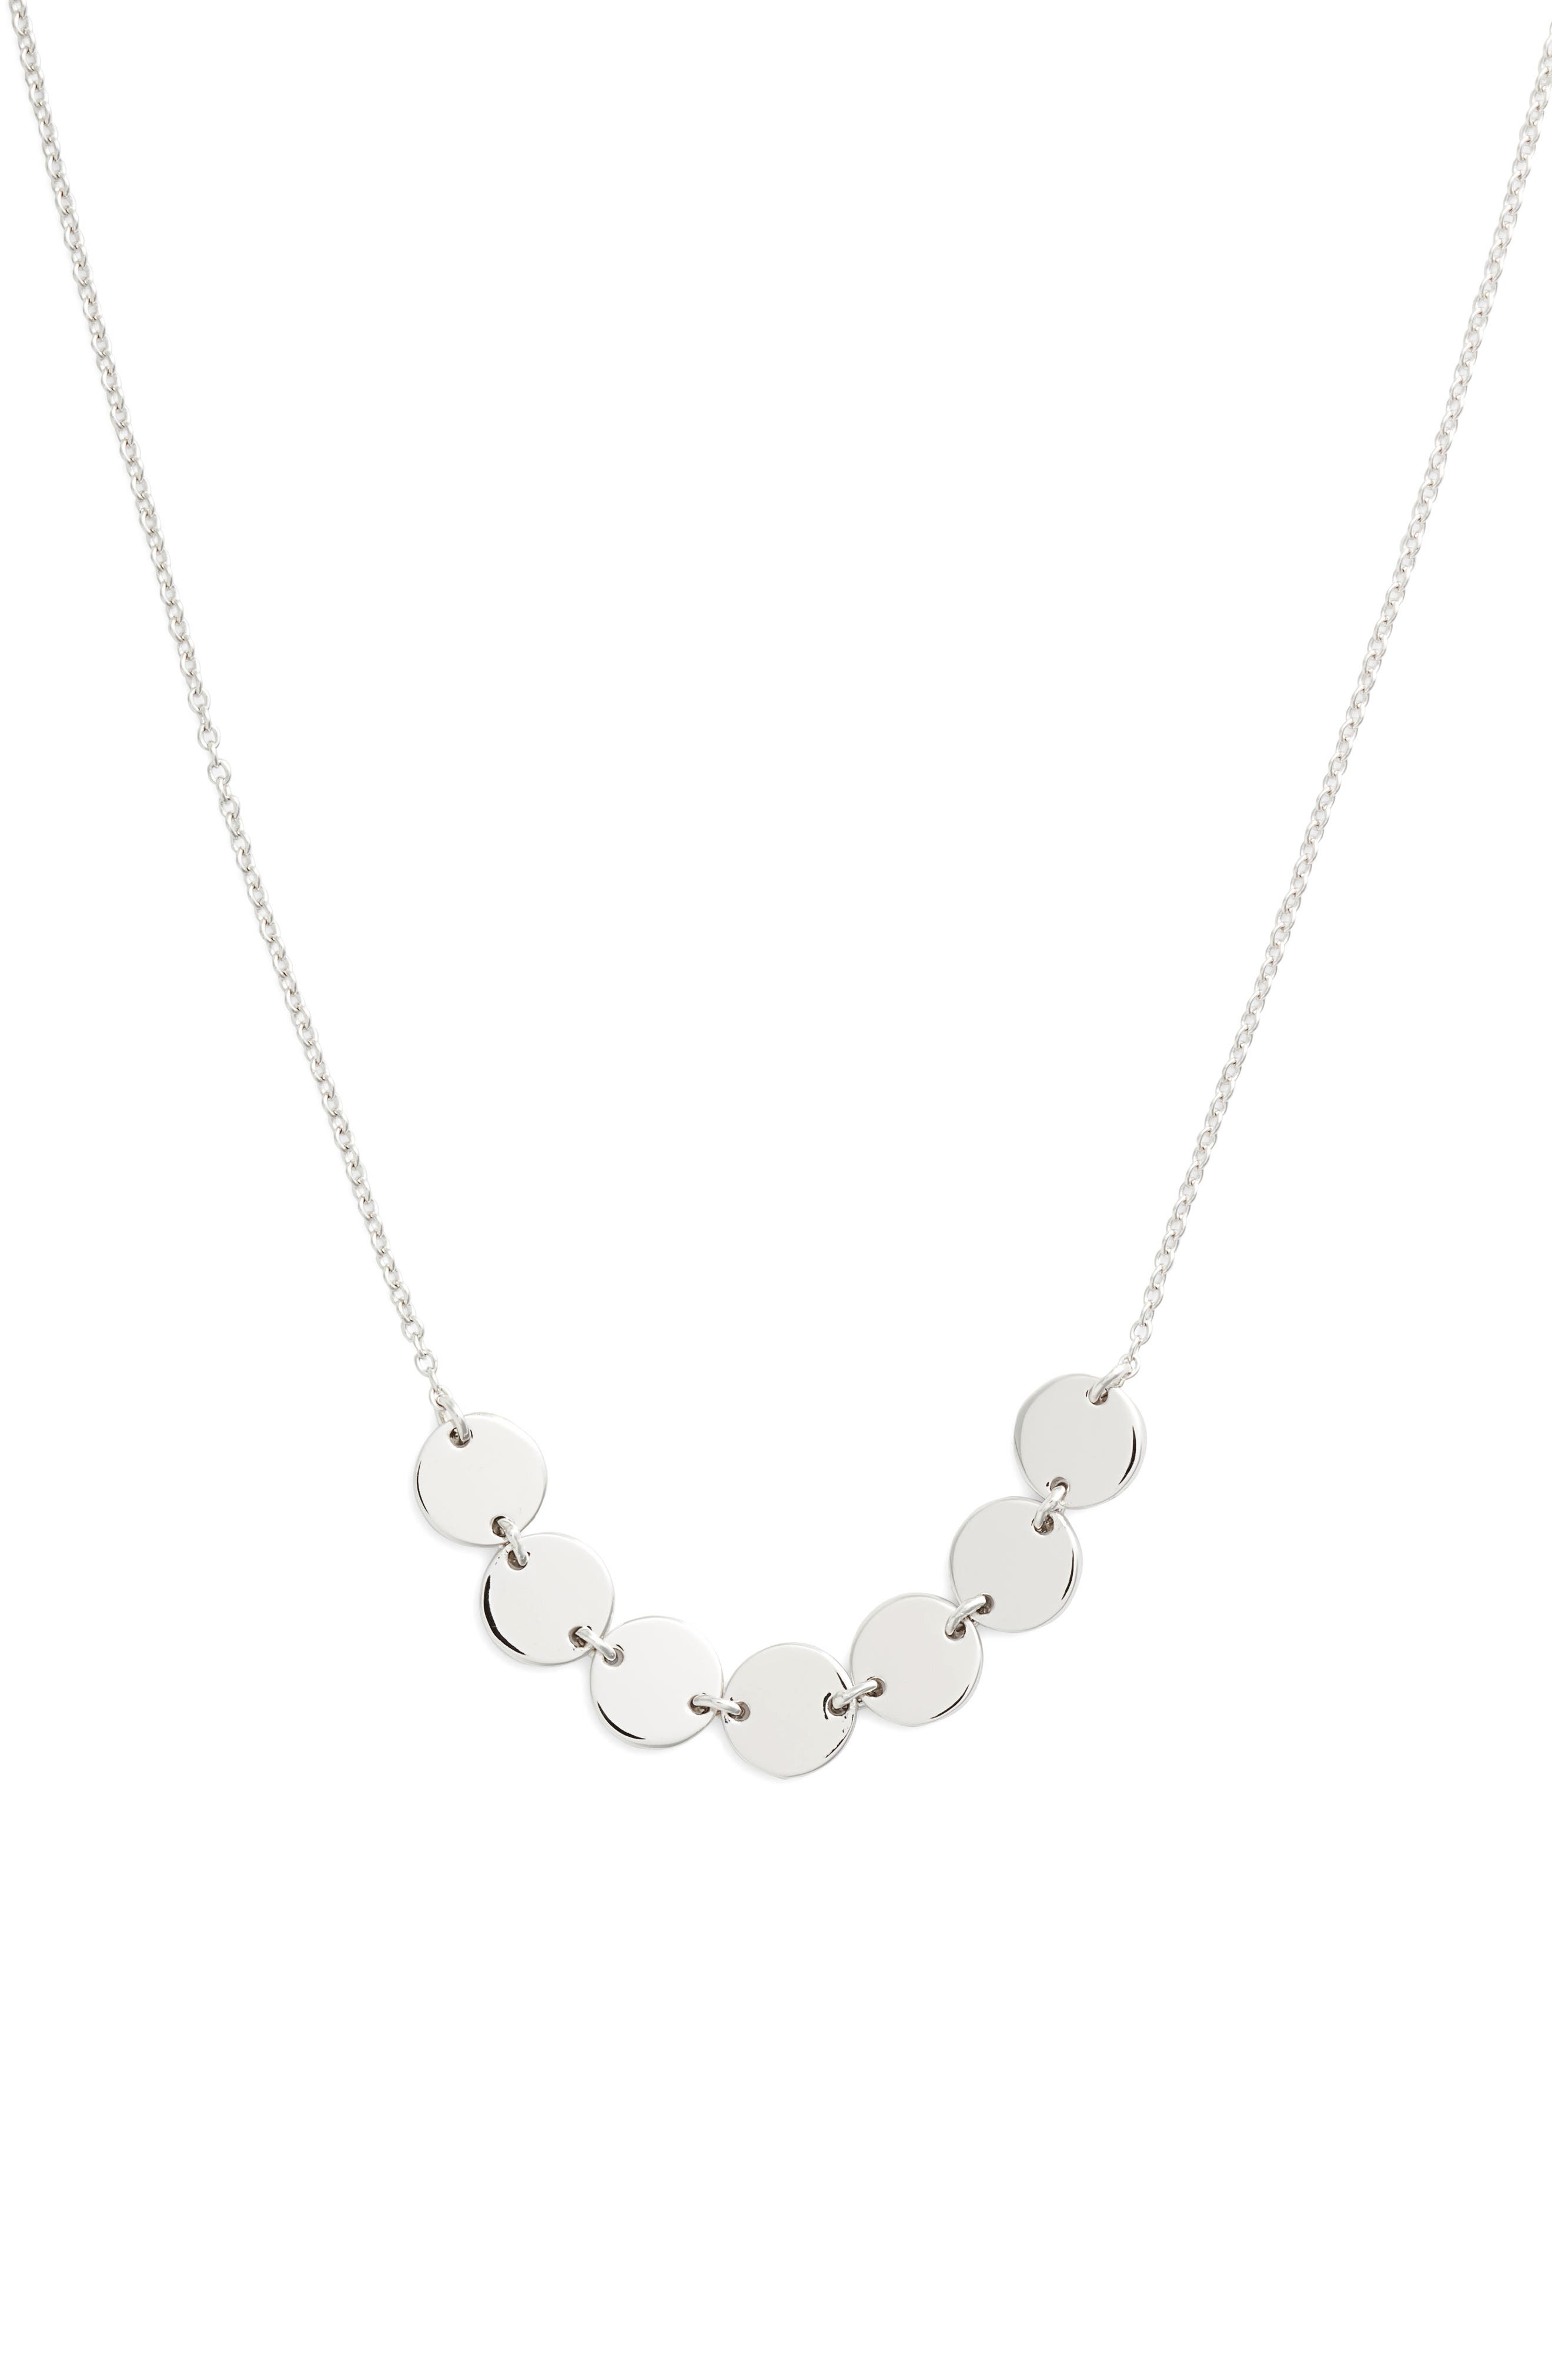 7 Symbols of Joy Choker Necklace, Main, color, SILVER/ CLEAR